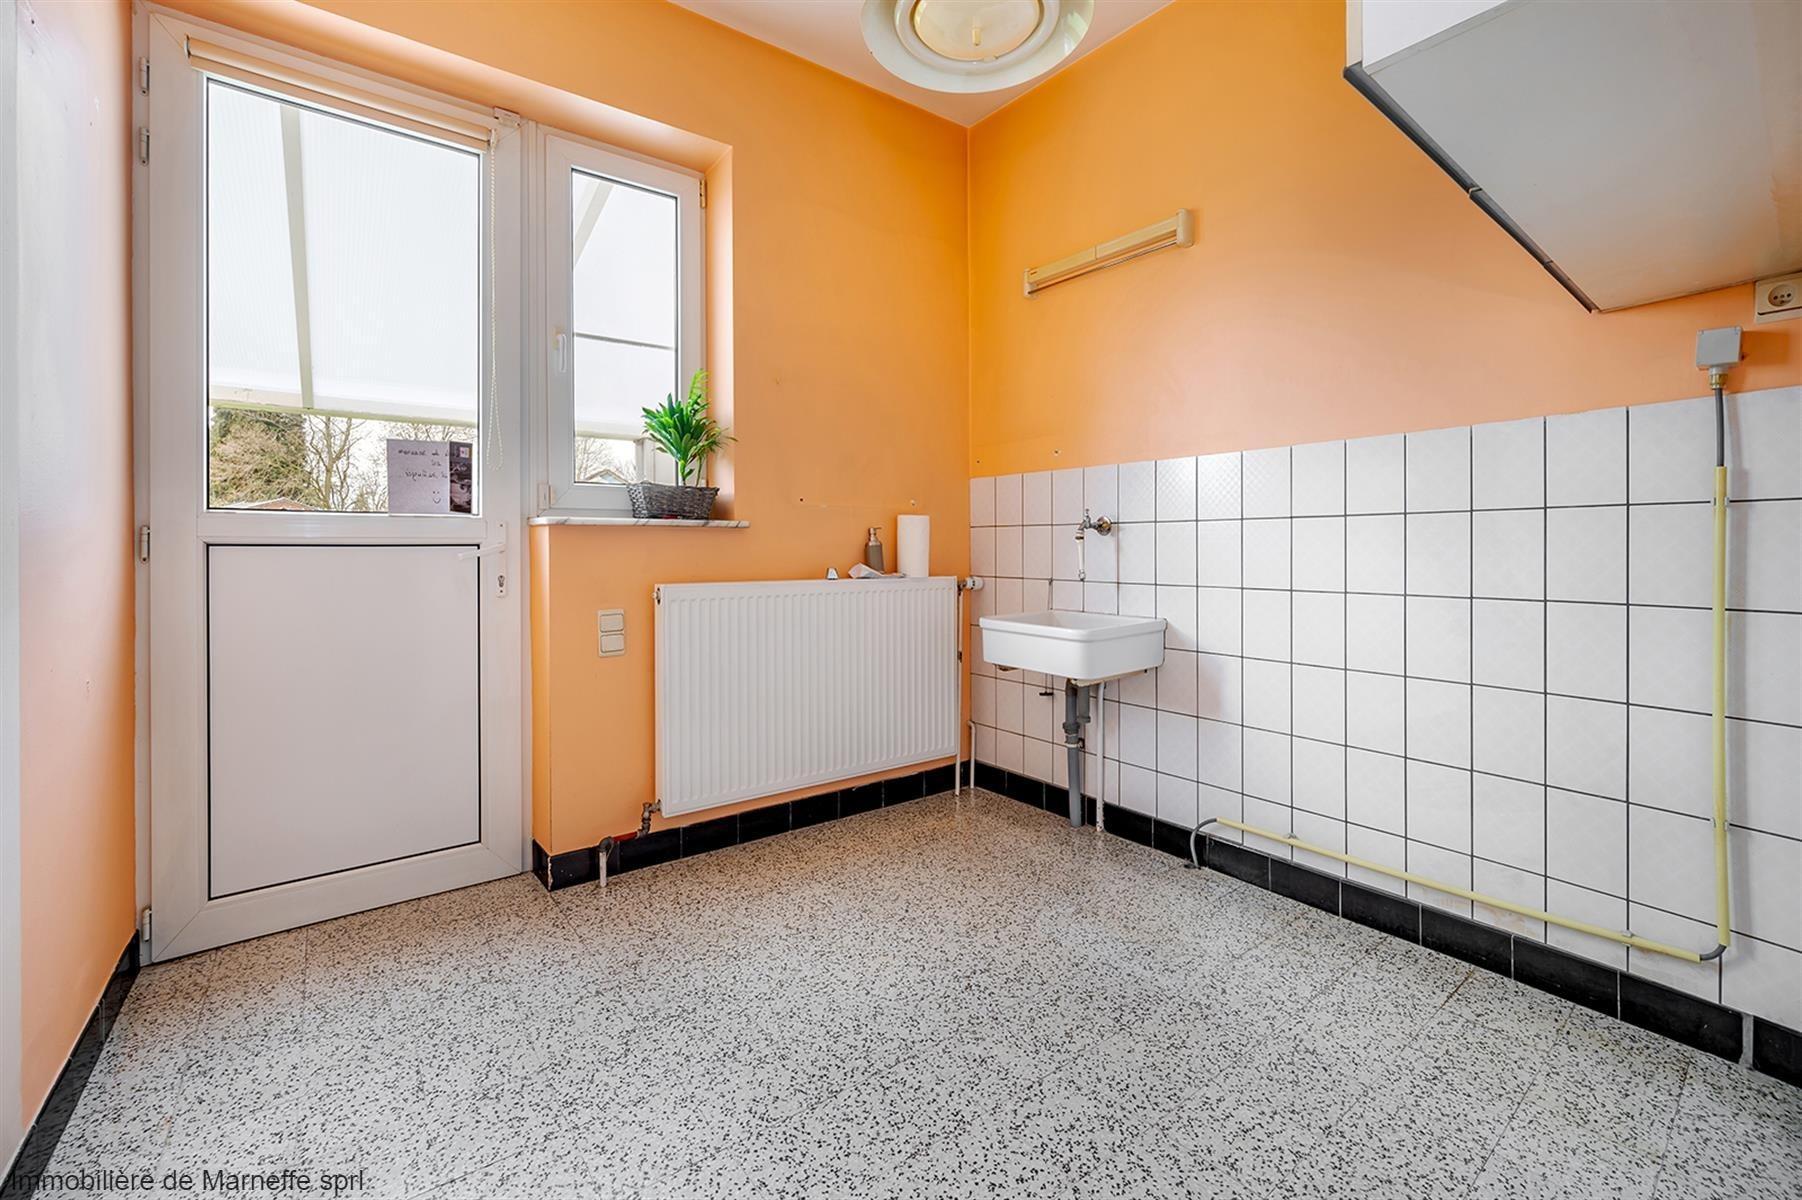 Maison - Berloz - #4343525-11